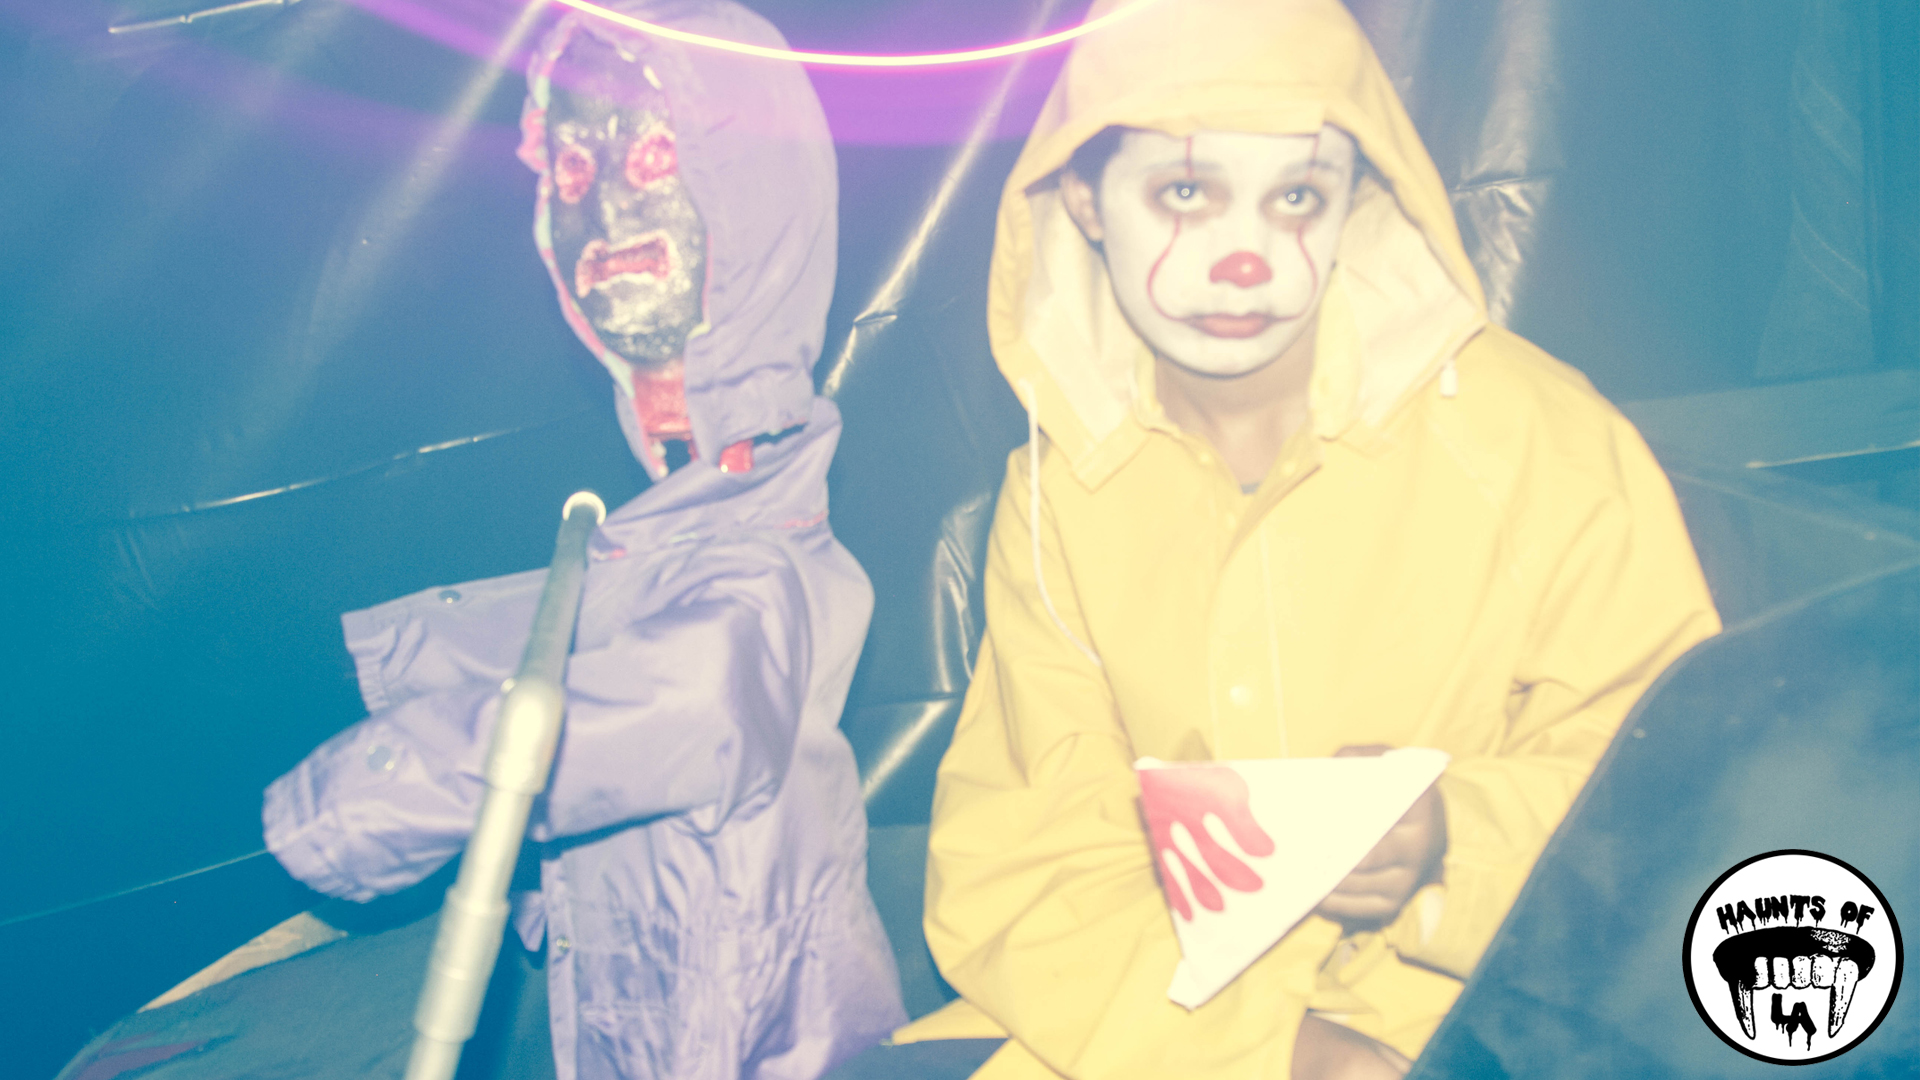 HOLA House of Horrors 02 sz.jpg